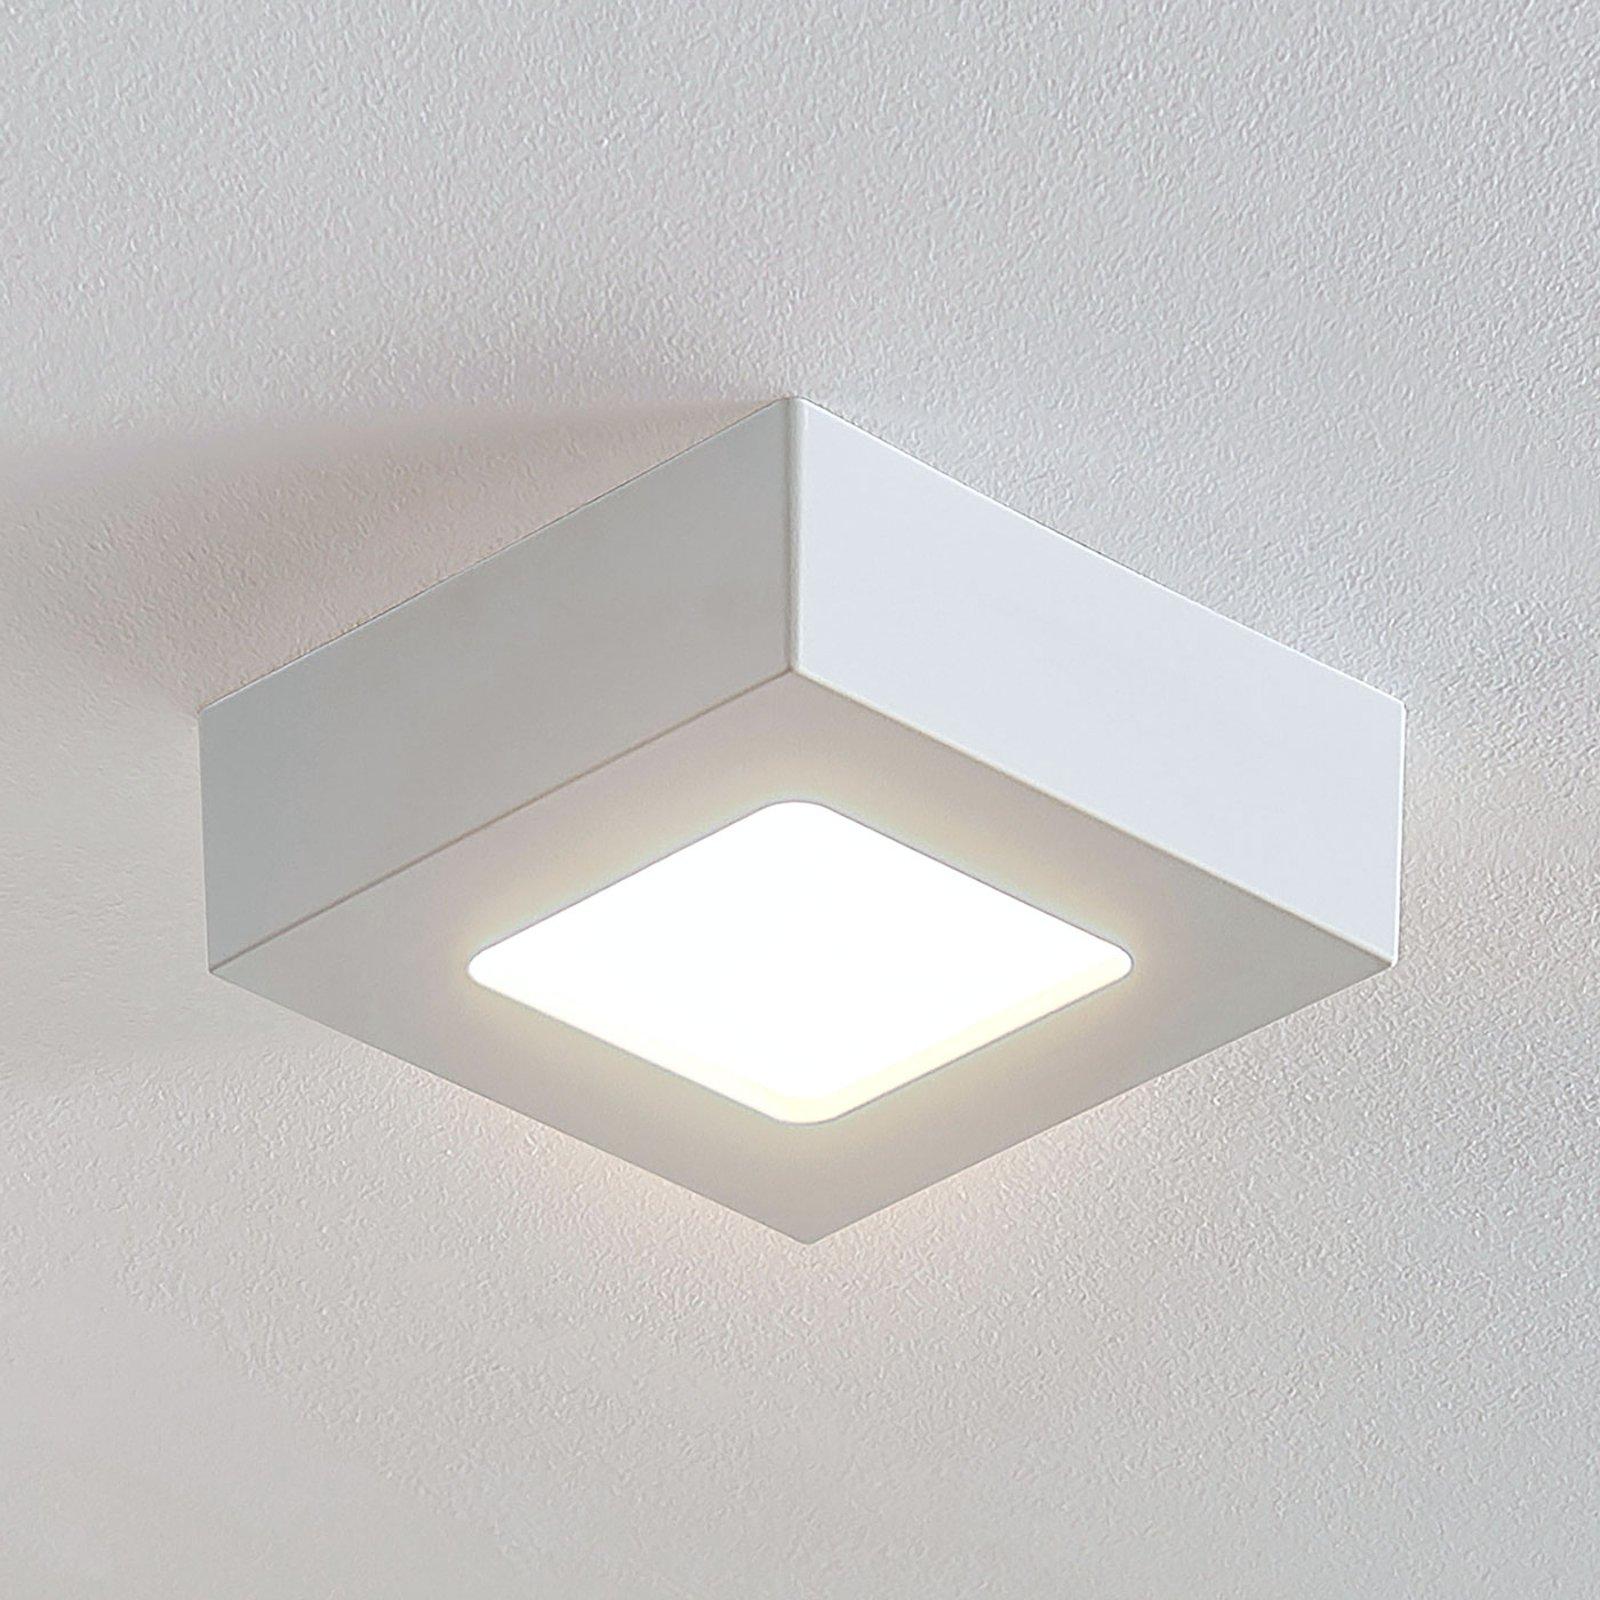 LED-taklampe Marlo, hvit, 3 000 K kantet 12,8 cm